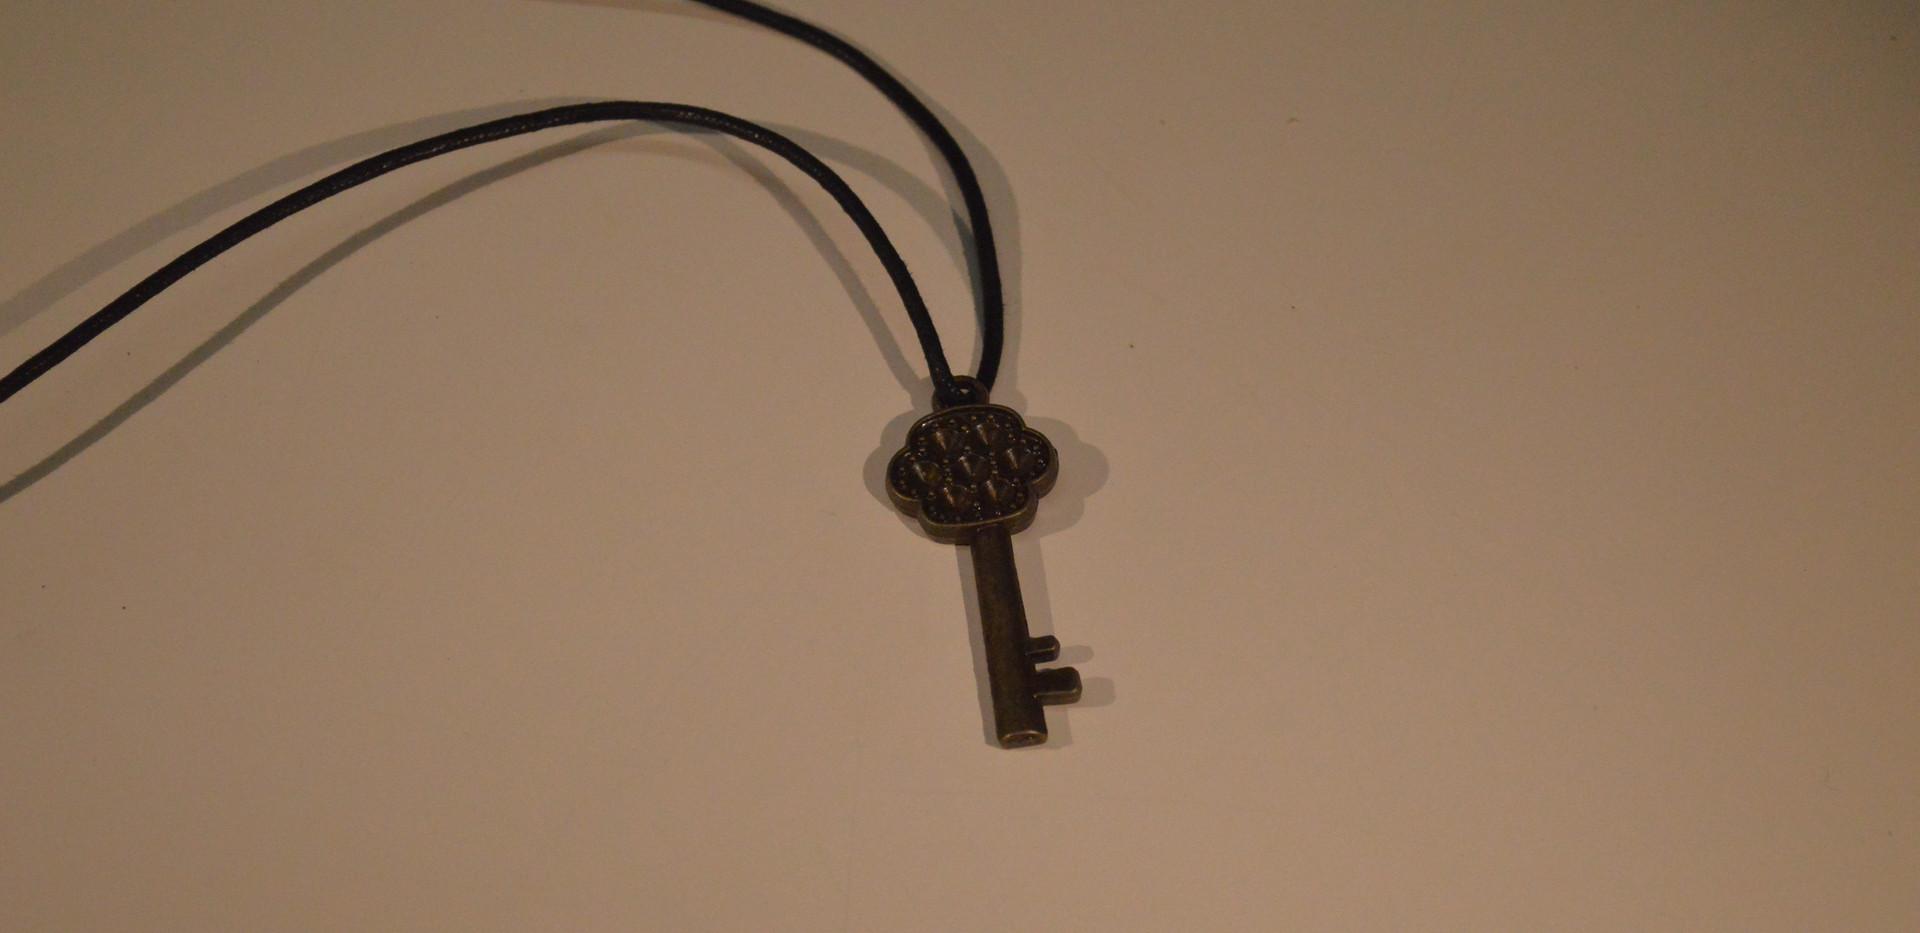 collier cléf n°2